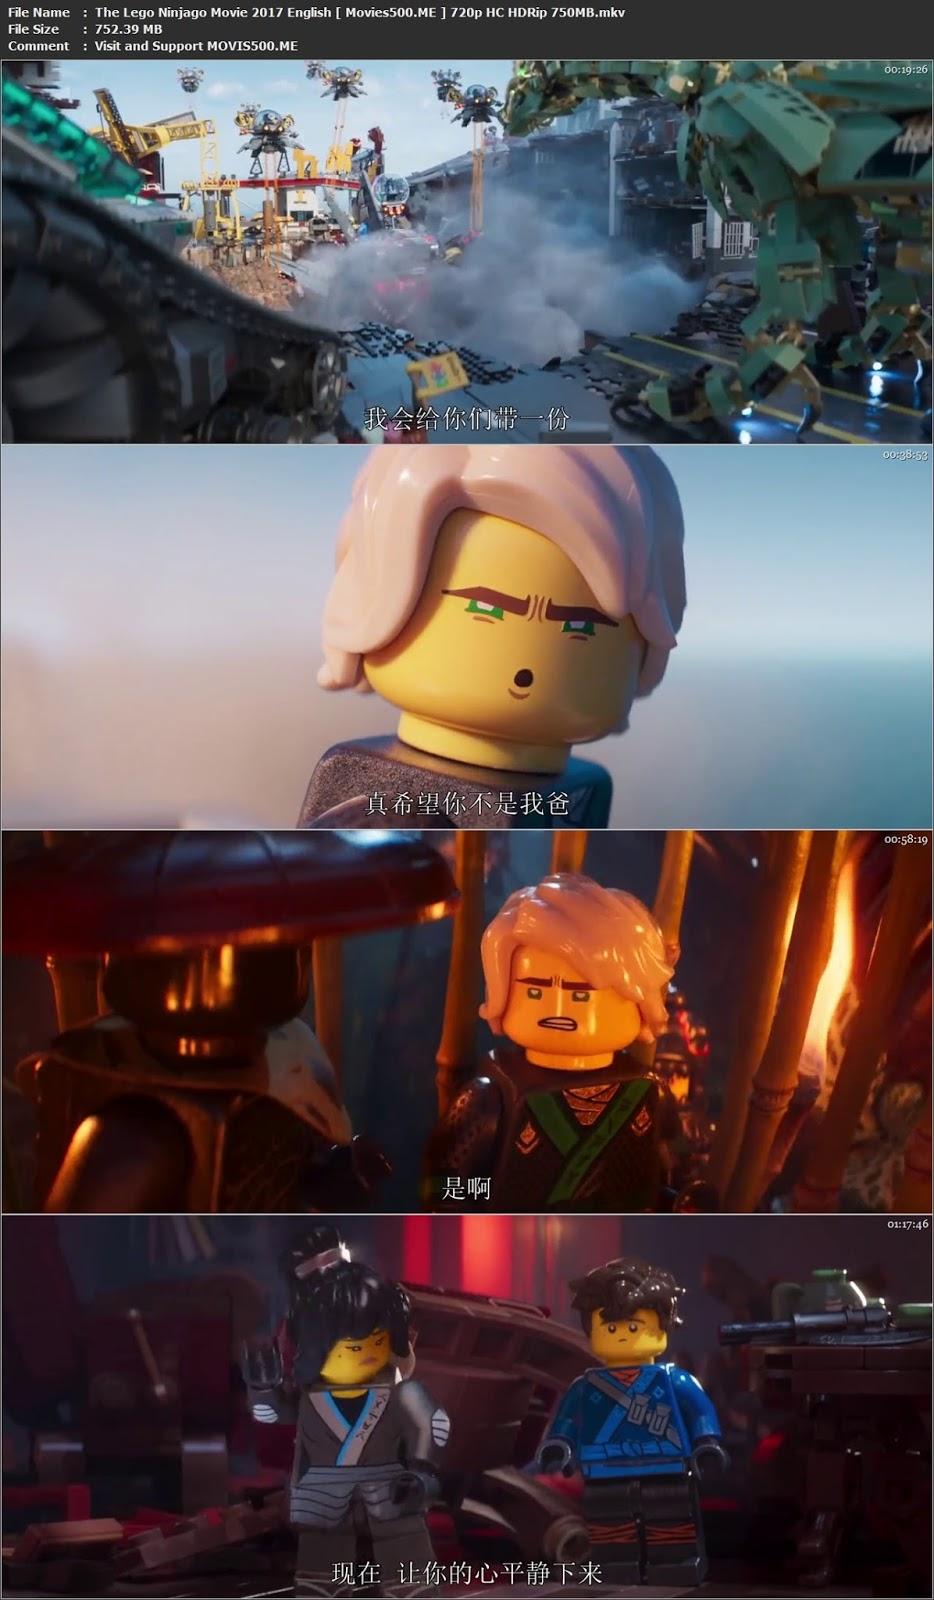 The Lego Ninjago Movie 2017 English 750MB HC HDRip 720p at gencoalumni.info